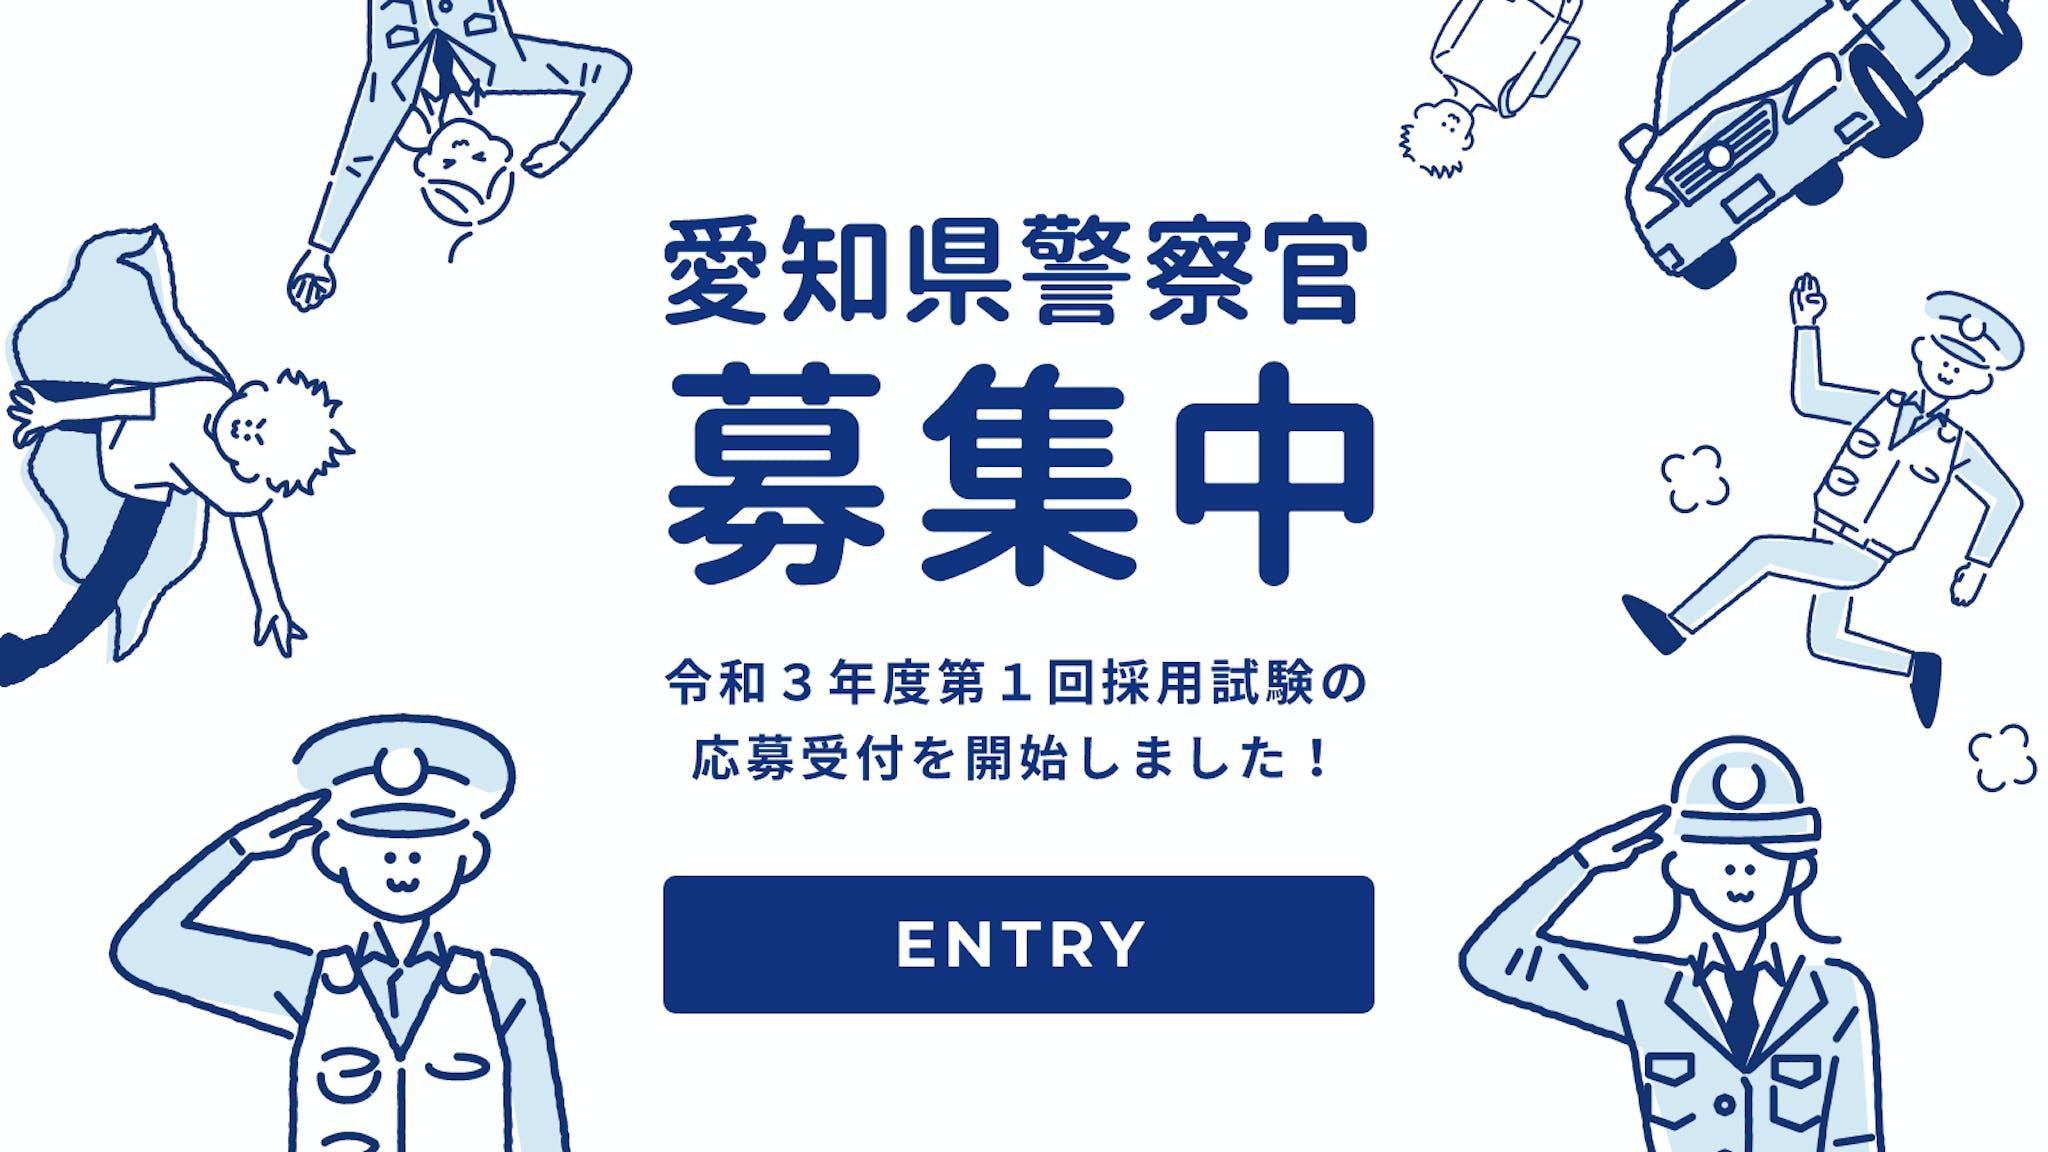 愛知県警さま/採用広報動画